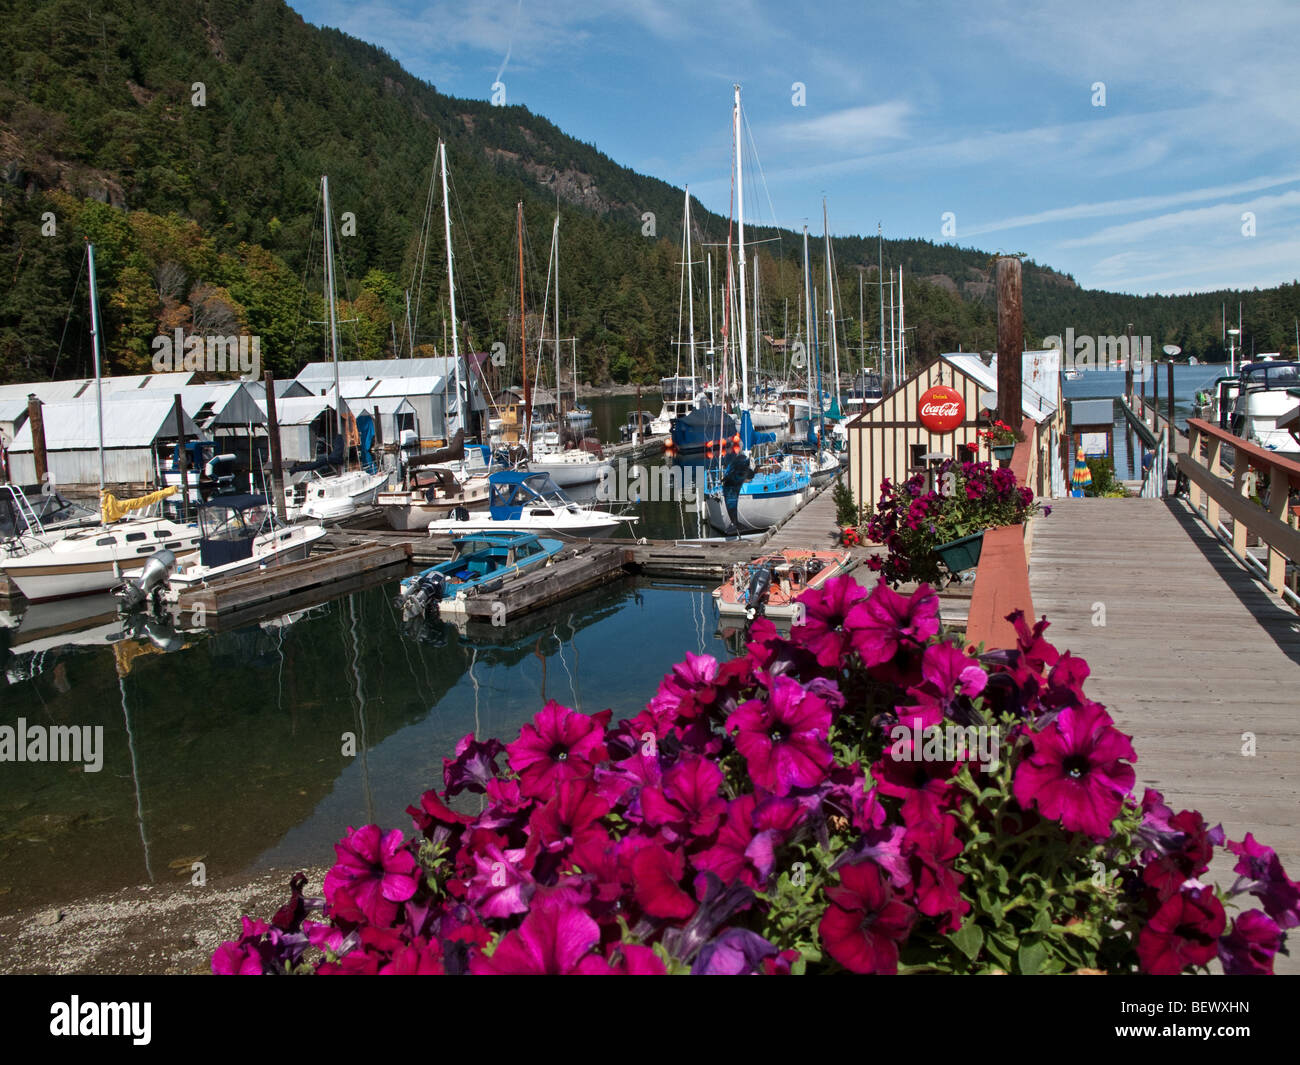 Genoa Bay, Vancouver Island, BC - Stock Image